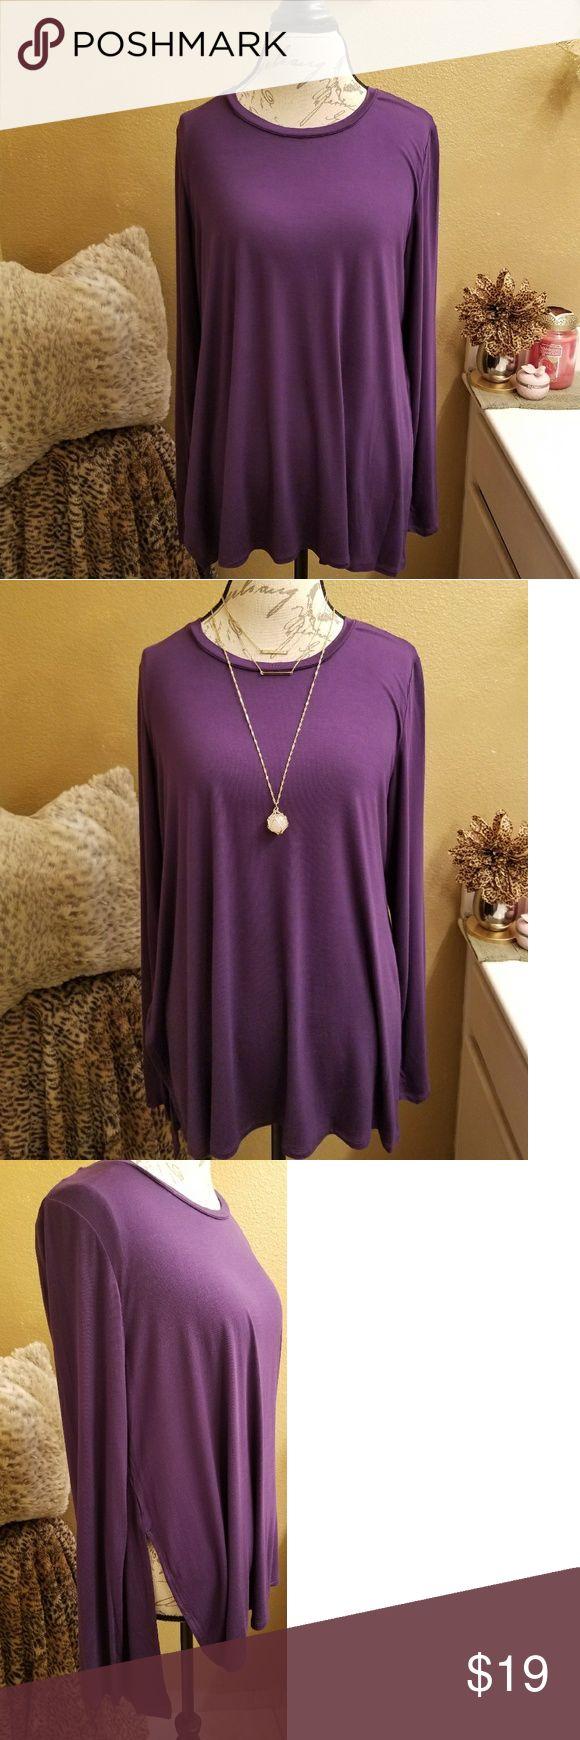 LOGO Top Lori Goldstein Deep Purple Long Sleeve Top. Spit Side styling. 95% Rayon 5%Spandex. Length: 28 1/2 inches  Bust: 21 inches. LOGO Tops Tees - Long Sleeve